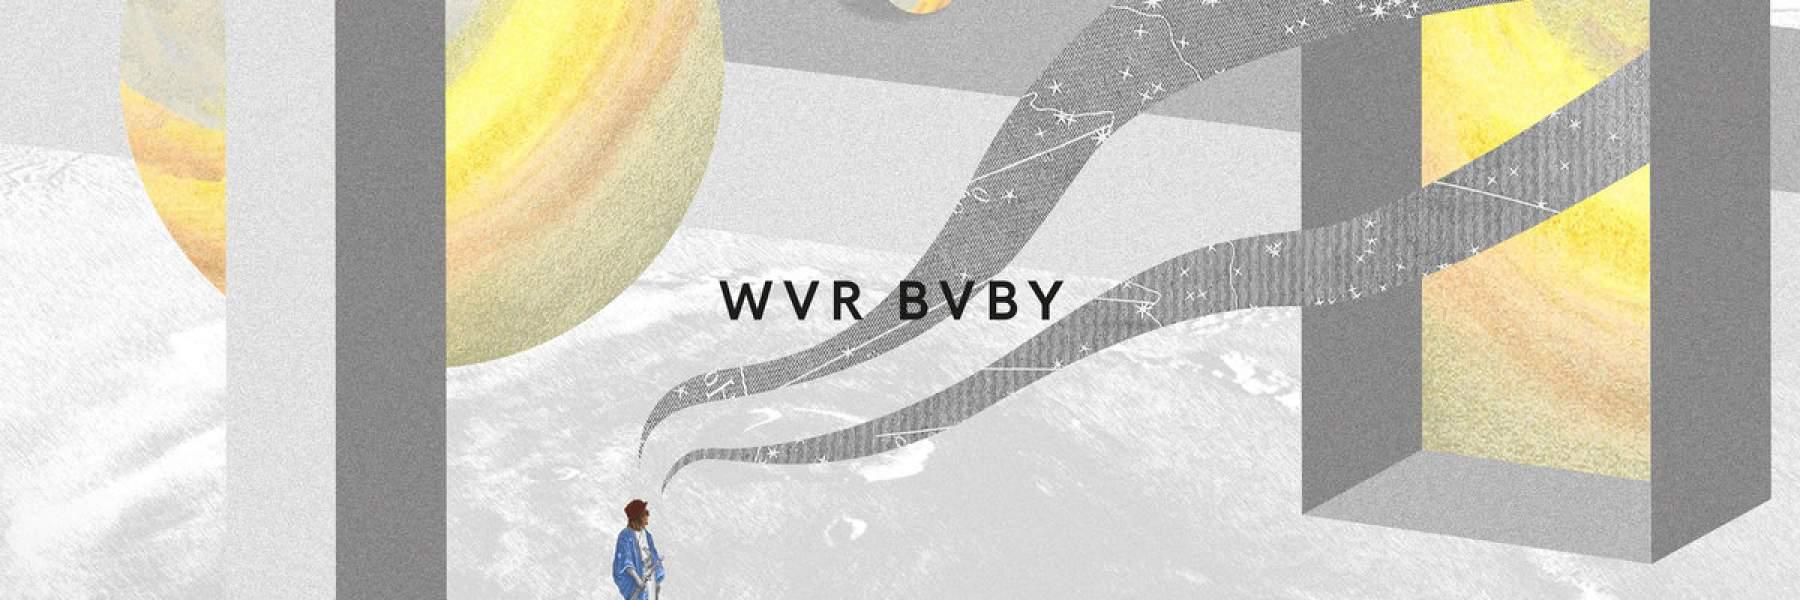 WVR BVBY